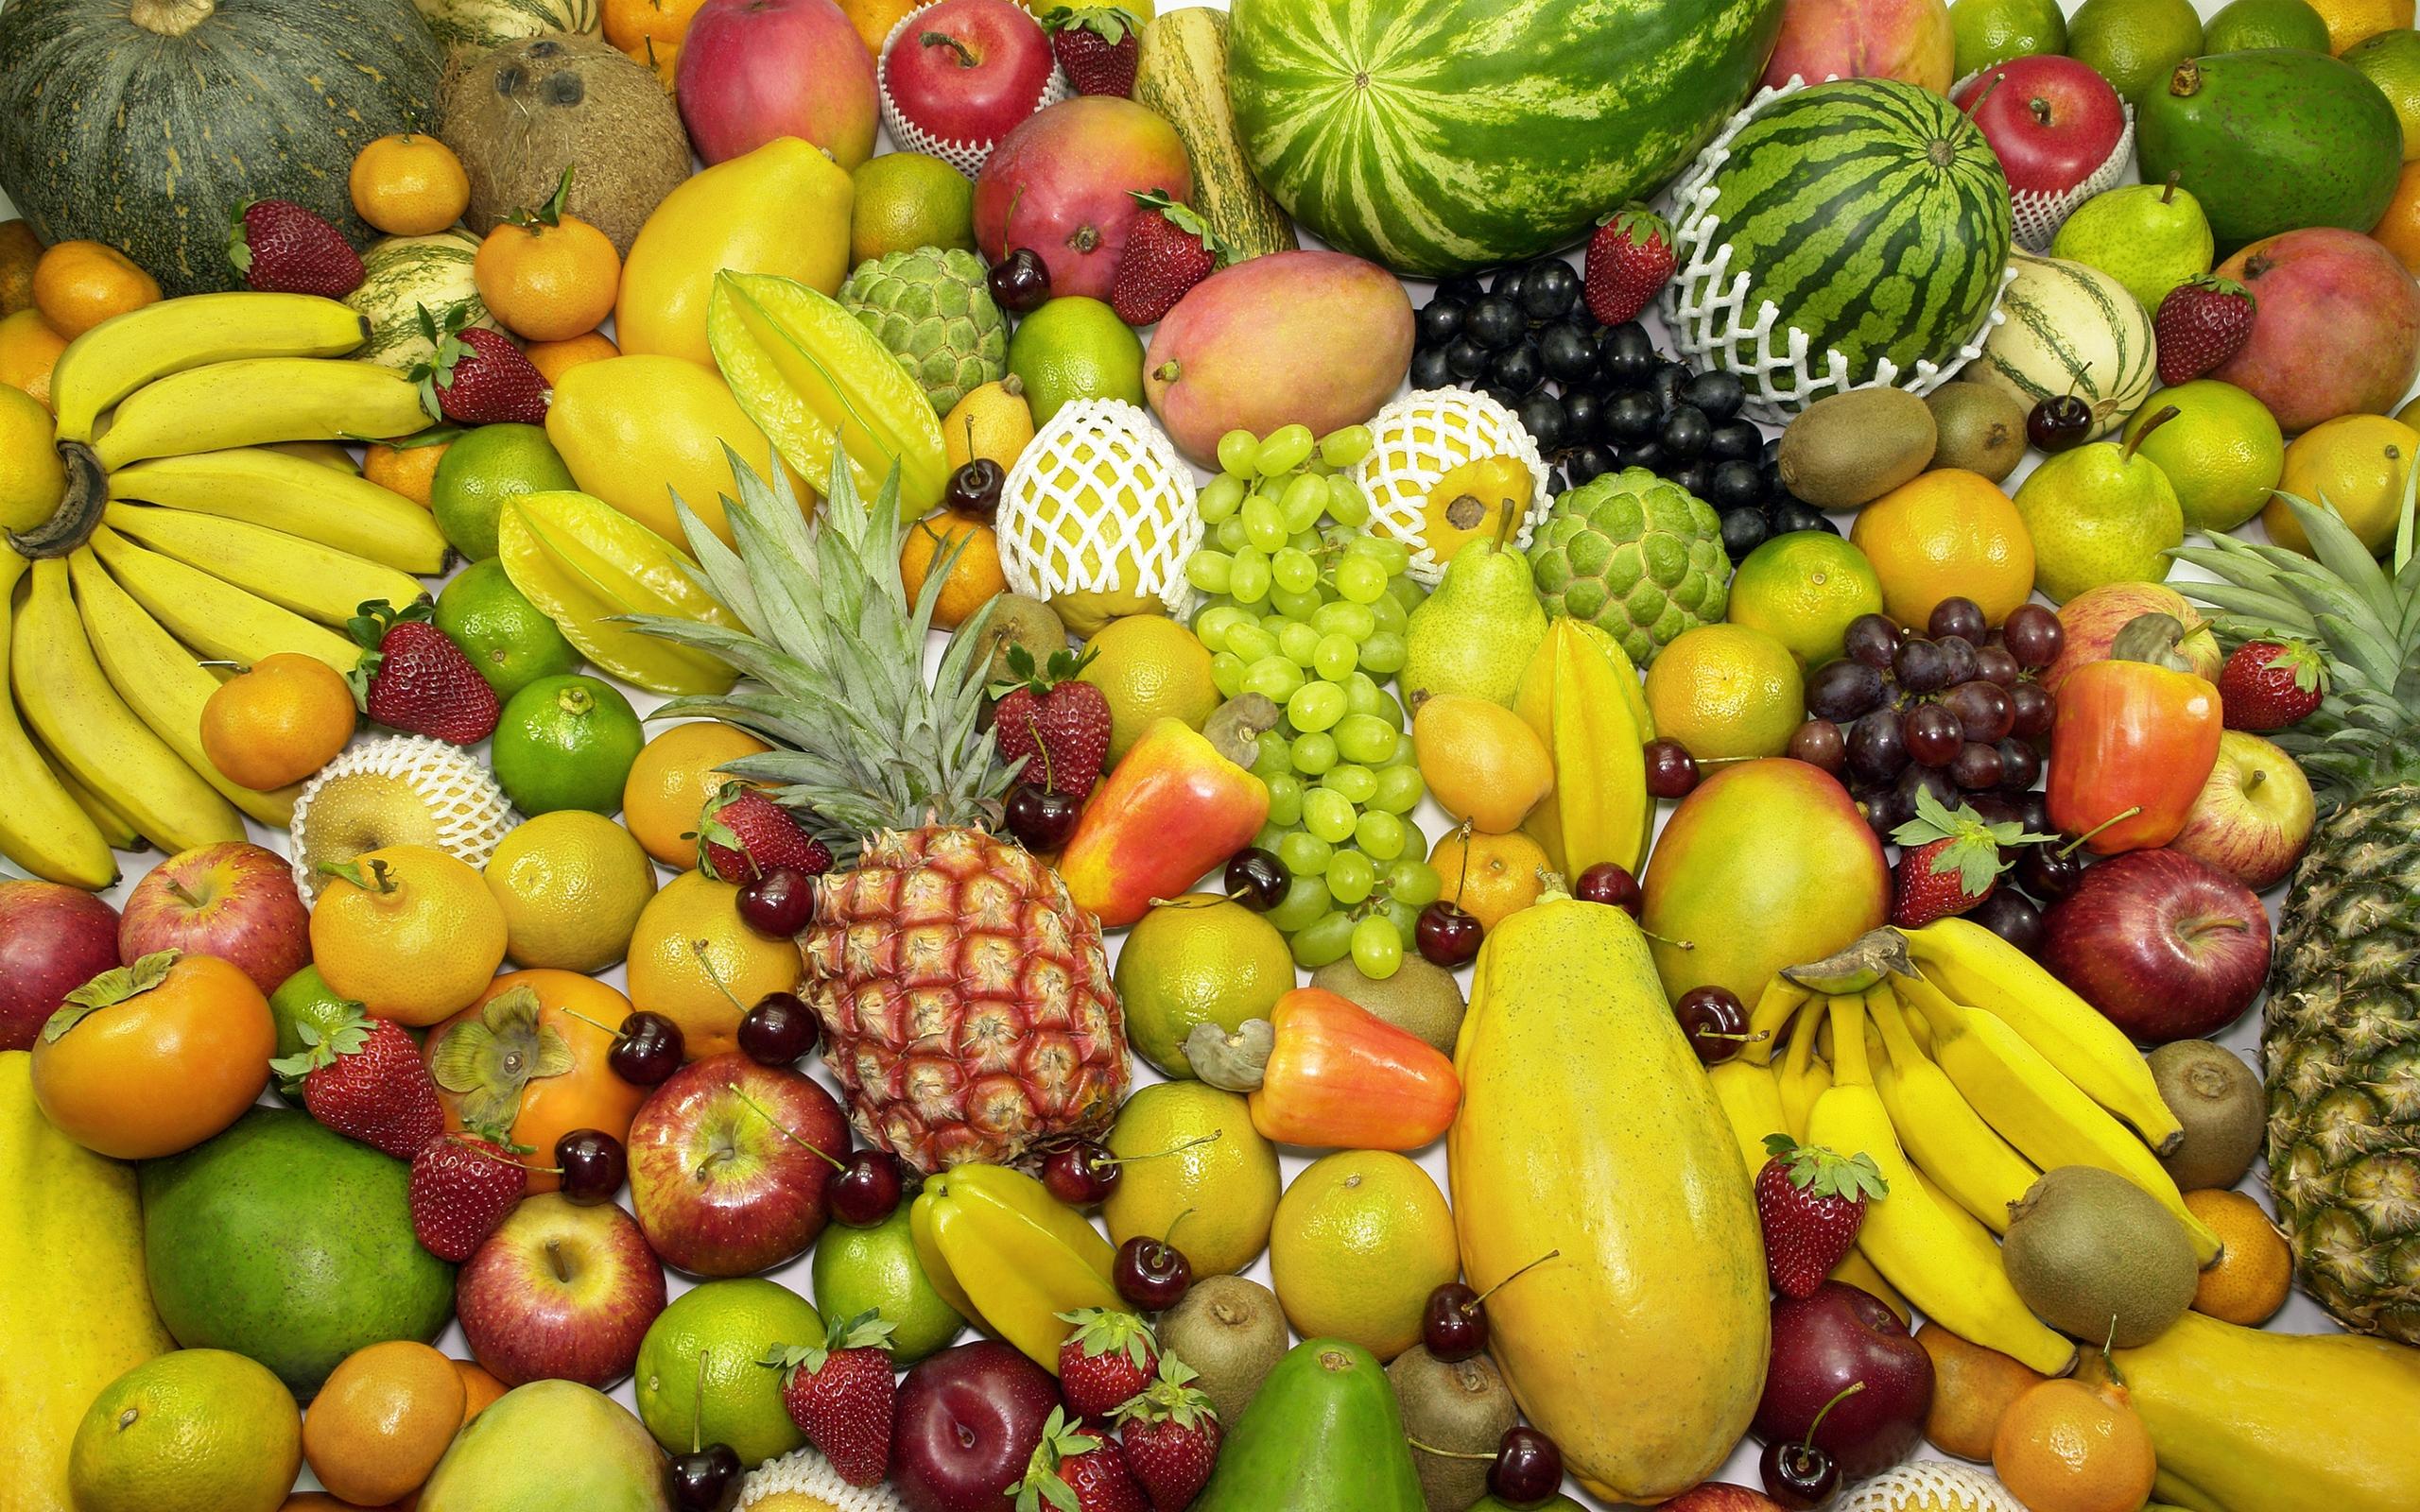 Fruit Backgrounds Free Download  Pixelstalknet